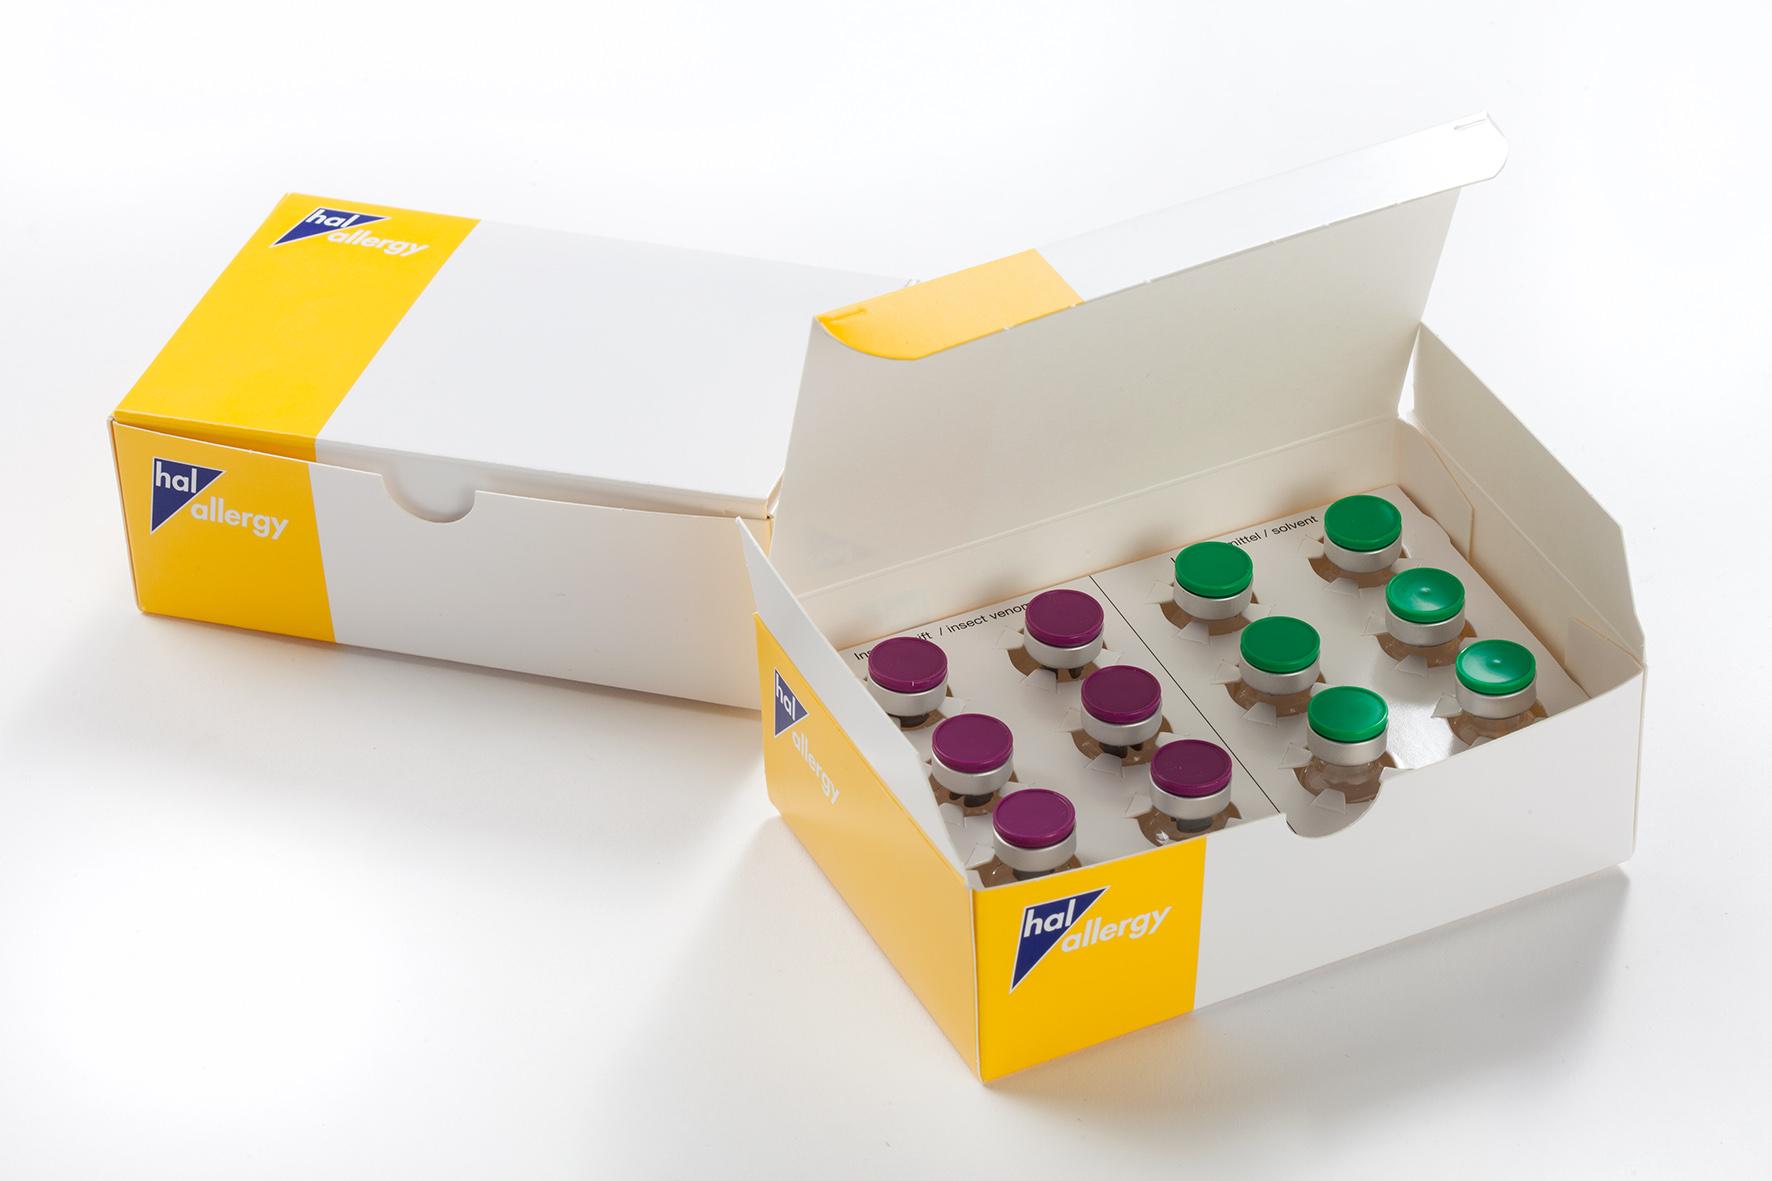 carton-award-image 140516